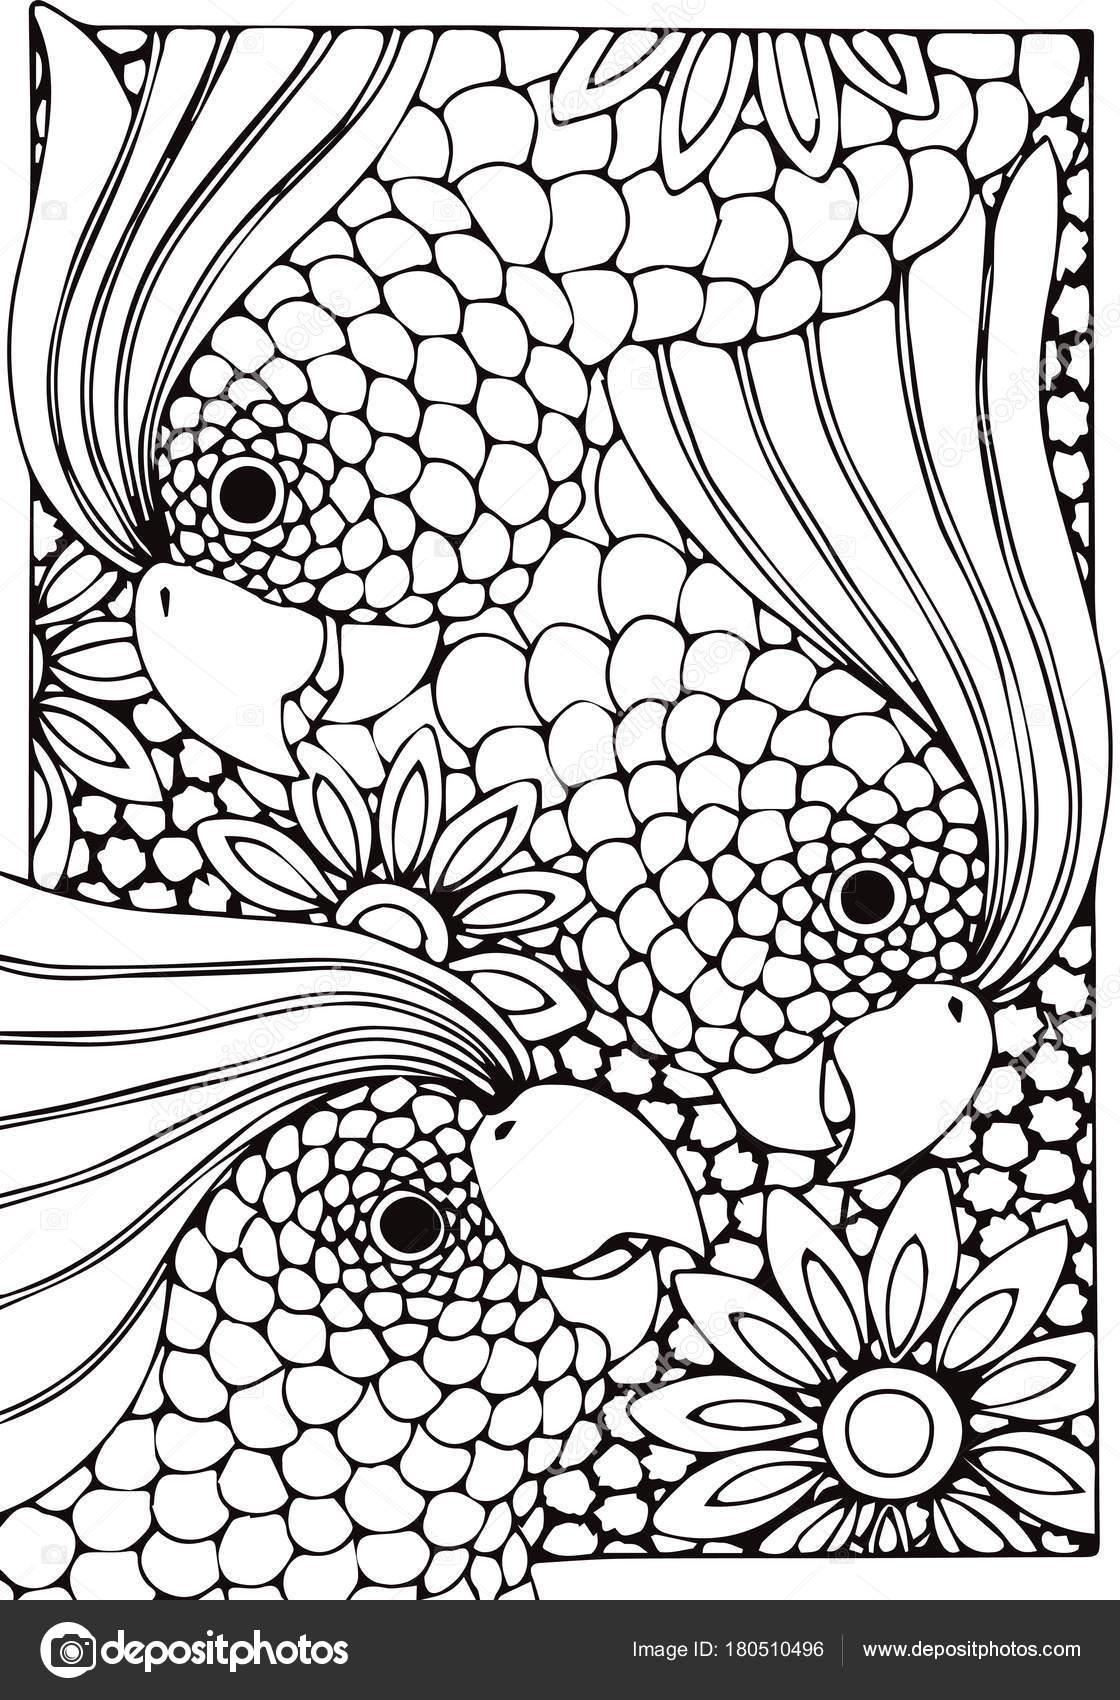 adulto, dibujo, naturaleza, relax, antiestrés, para colorear ...